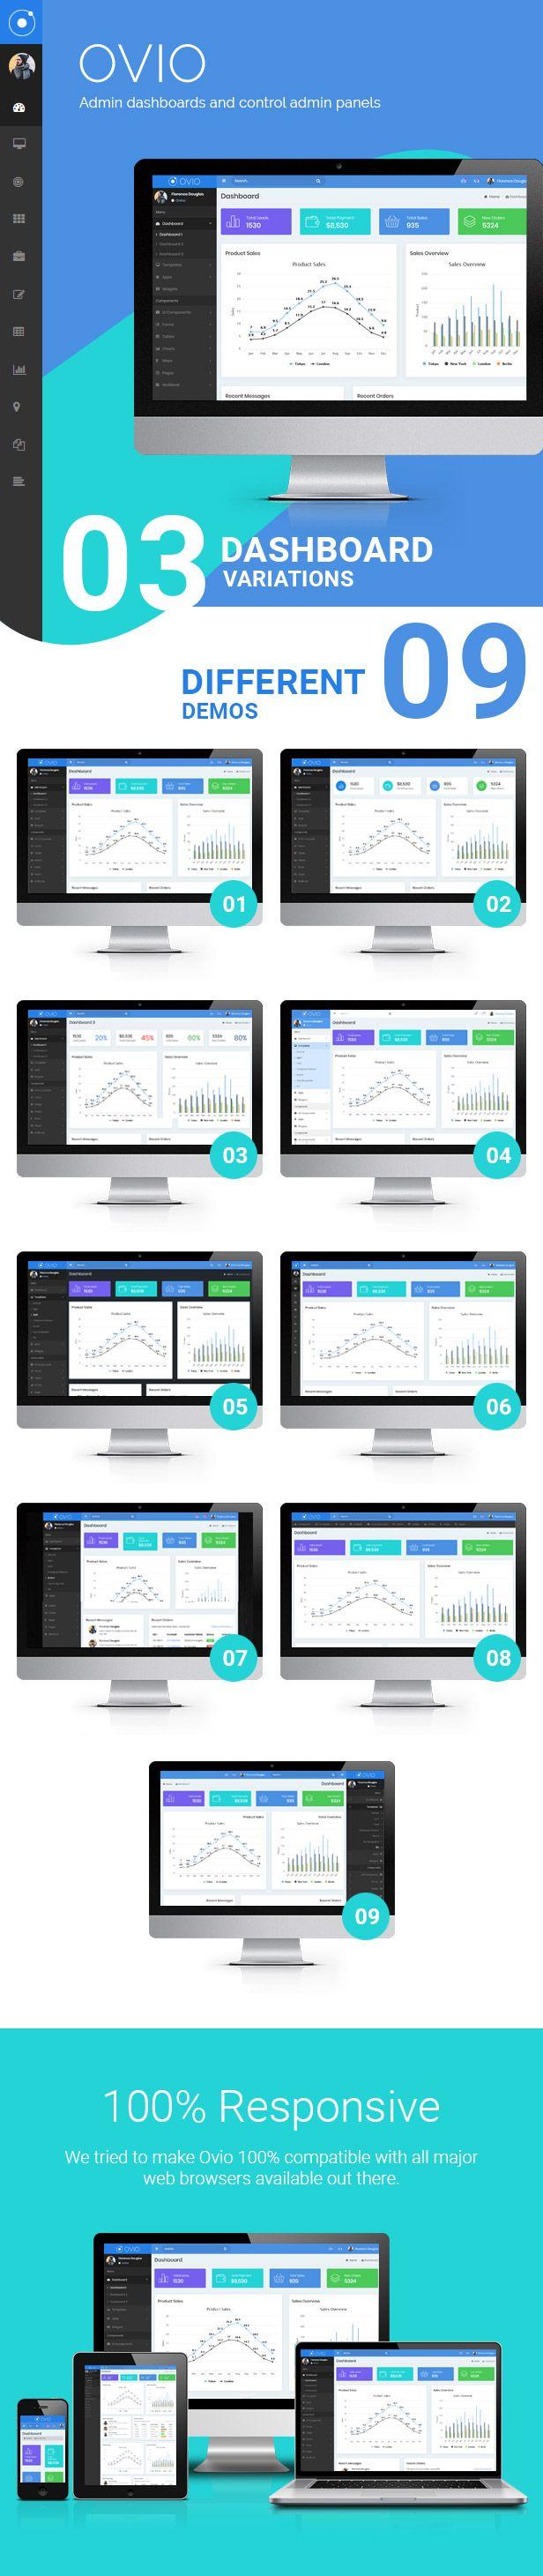 Ovio - Bootstrap Based Responsive Dashboard - Admin Template